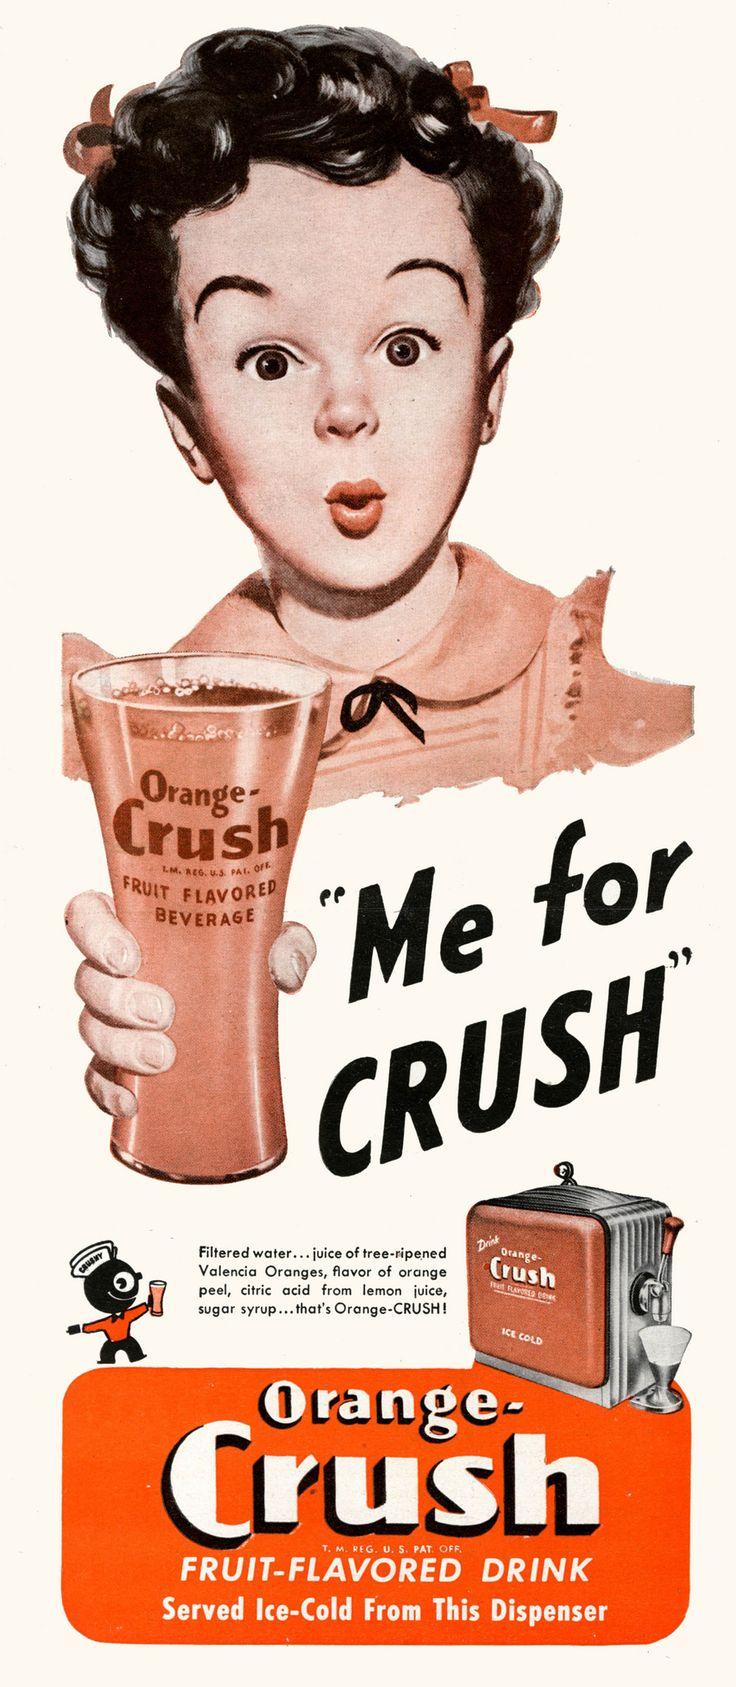 Orange Crush. It's A Fruit-Flavored Beverage | 1947.